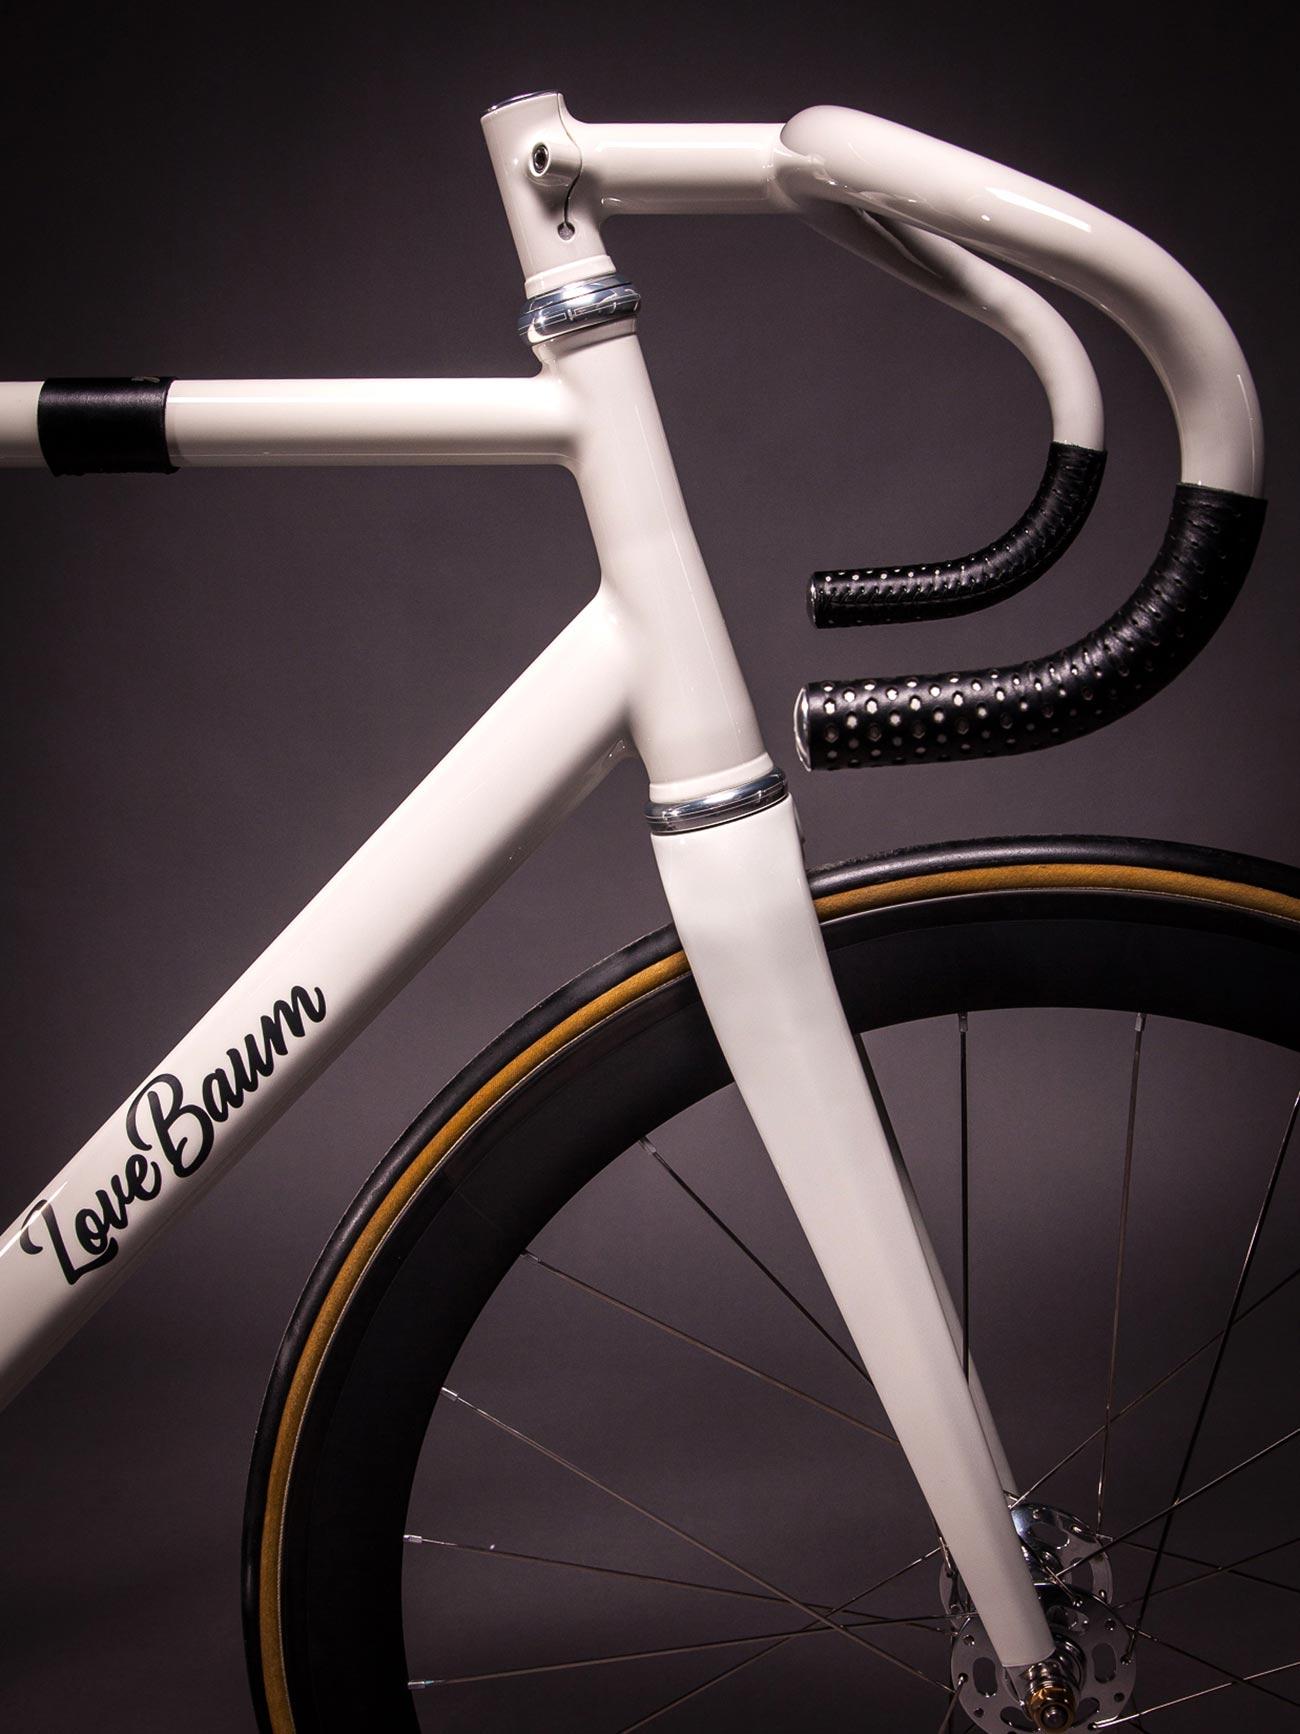 Curved Aero Track Bike By Lovebaum